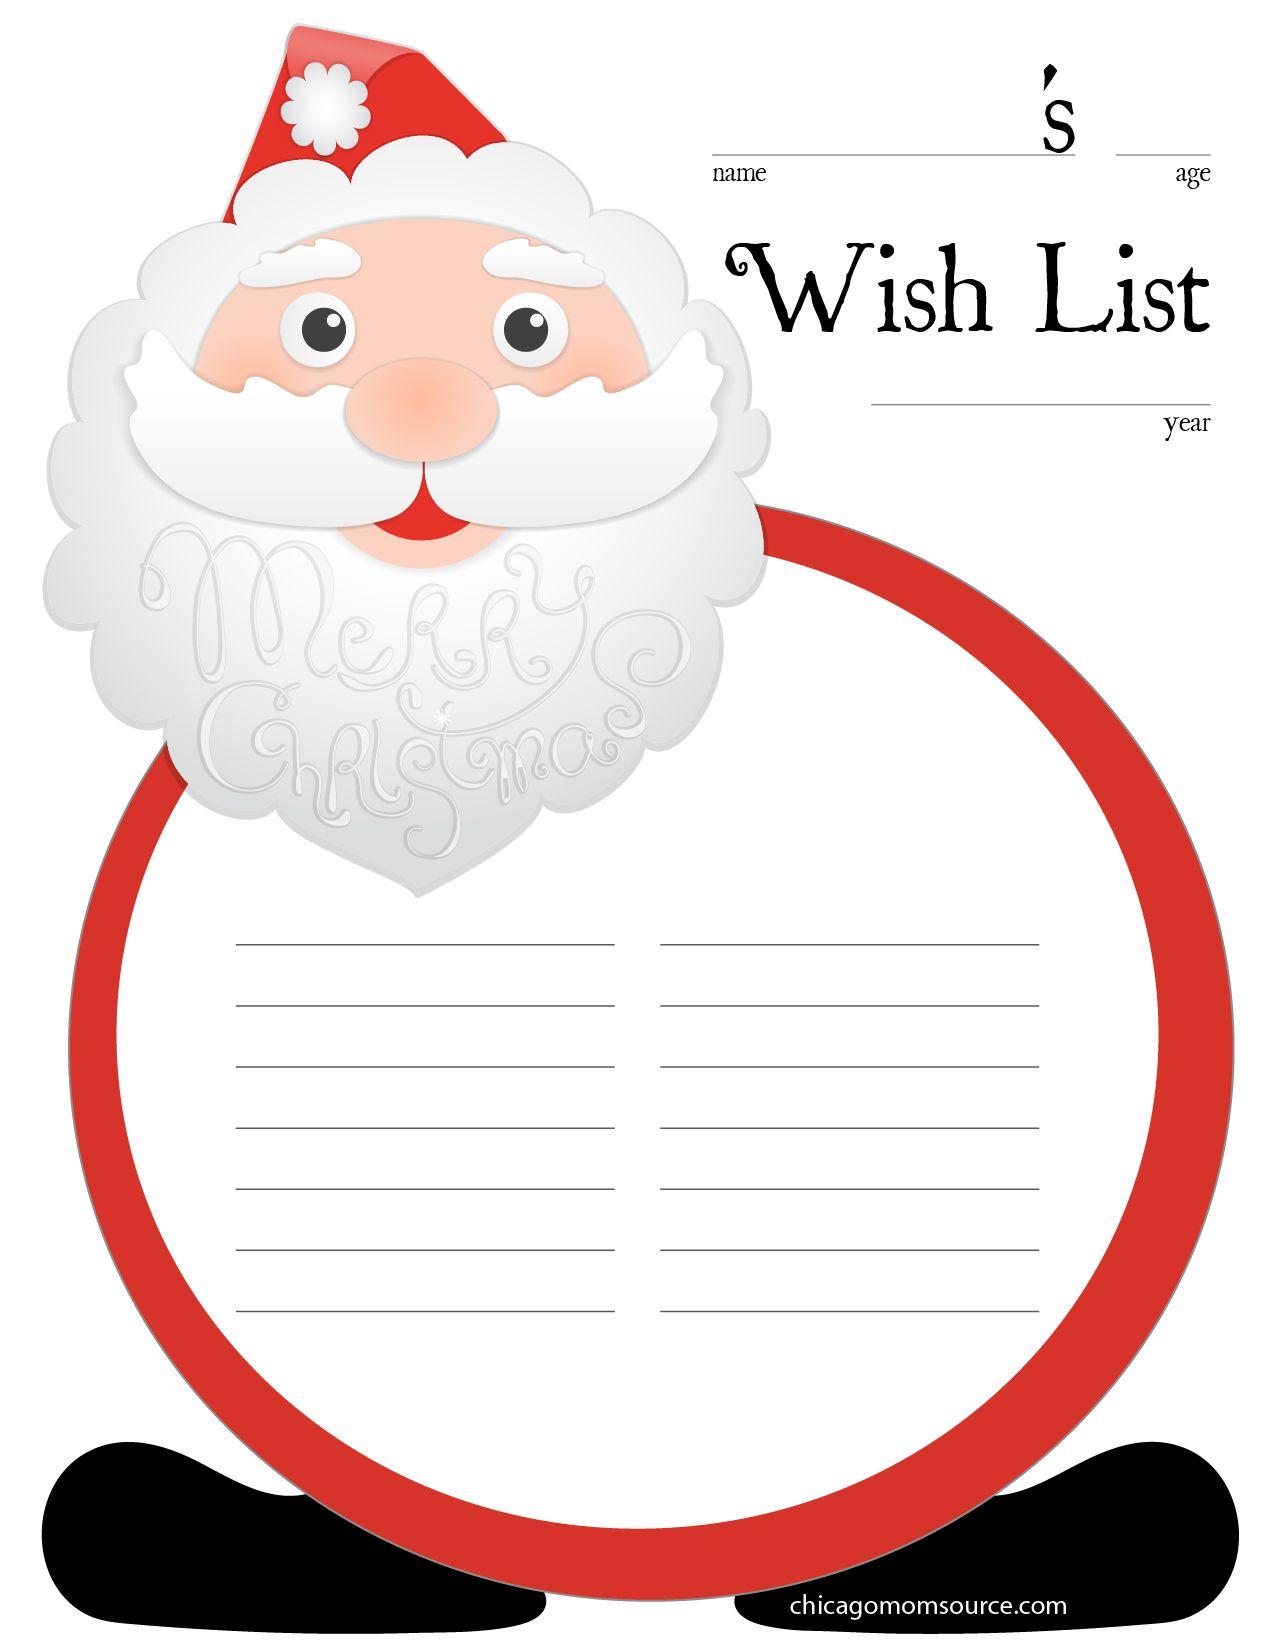 Icagomomsource Wish List Free Printable